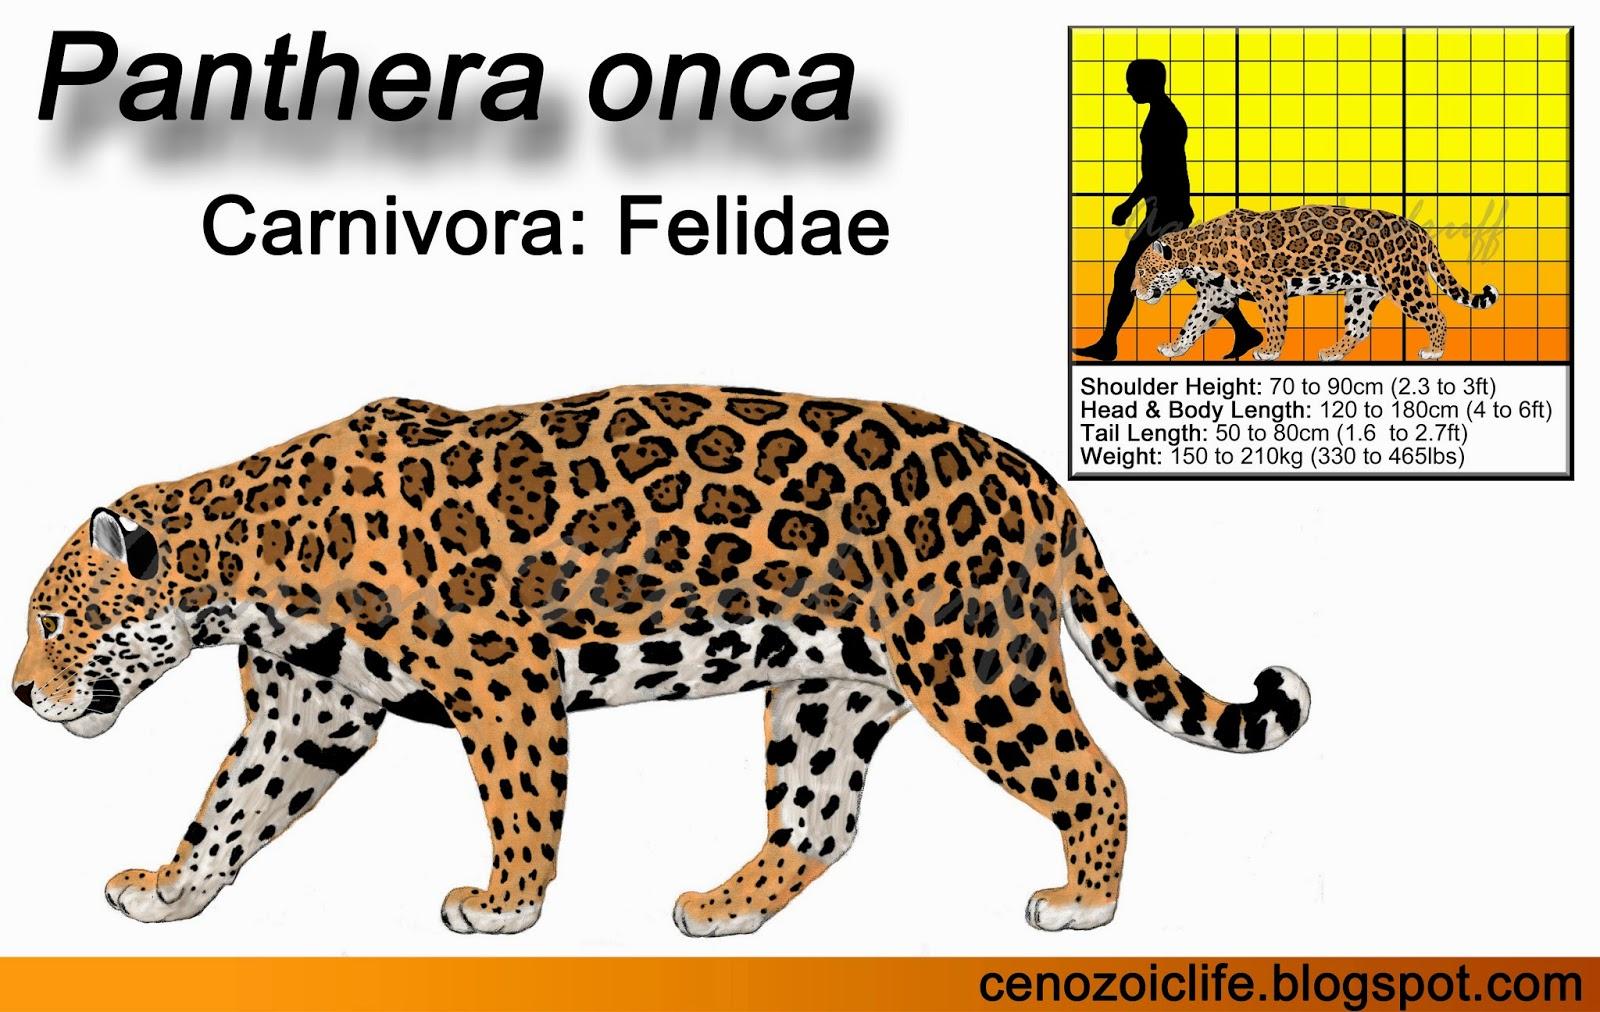 snow leopard anatomy diagram 2009 toyota corolla serpentine belt life in the cenozoic era jaguar panthera onca